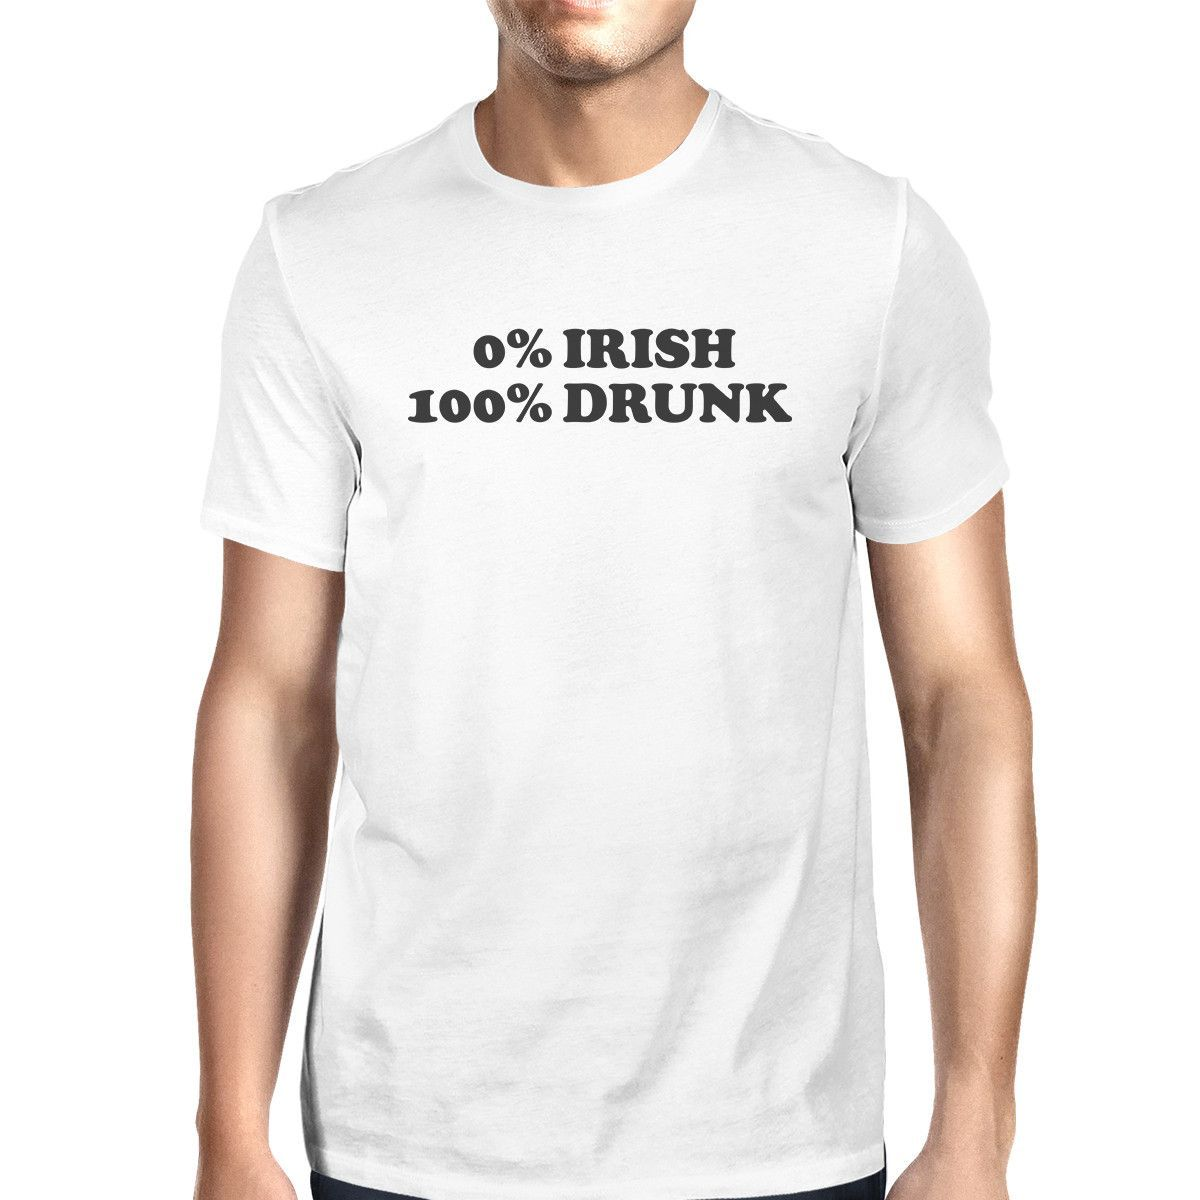 365 Printing 0/% Irish 100/% Drunk Dark Grey Funny Graphic HoodieGifts for Him